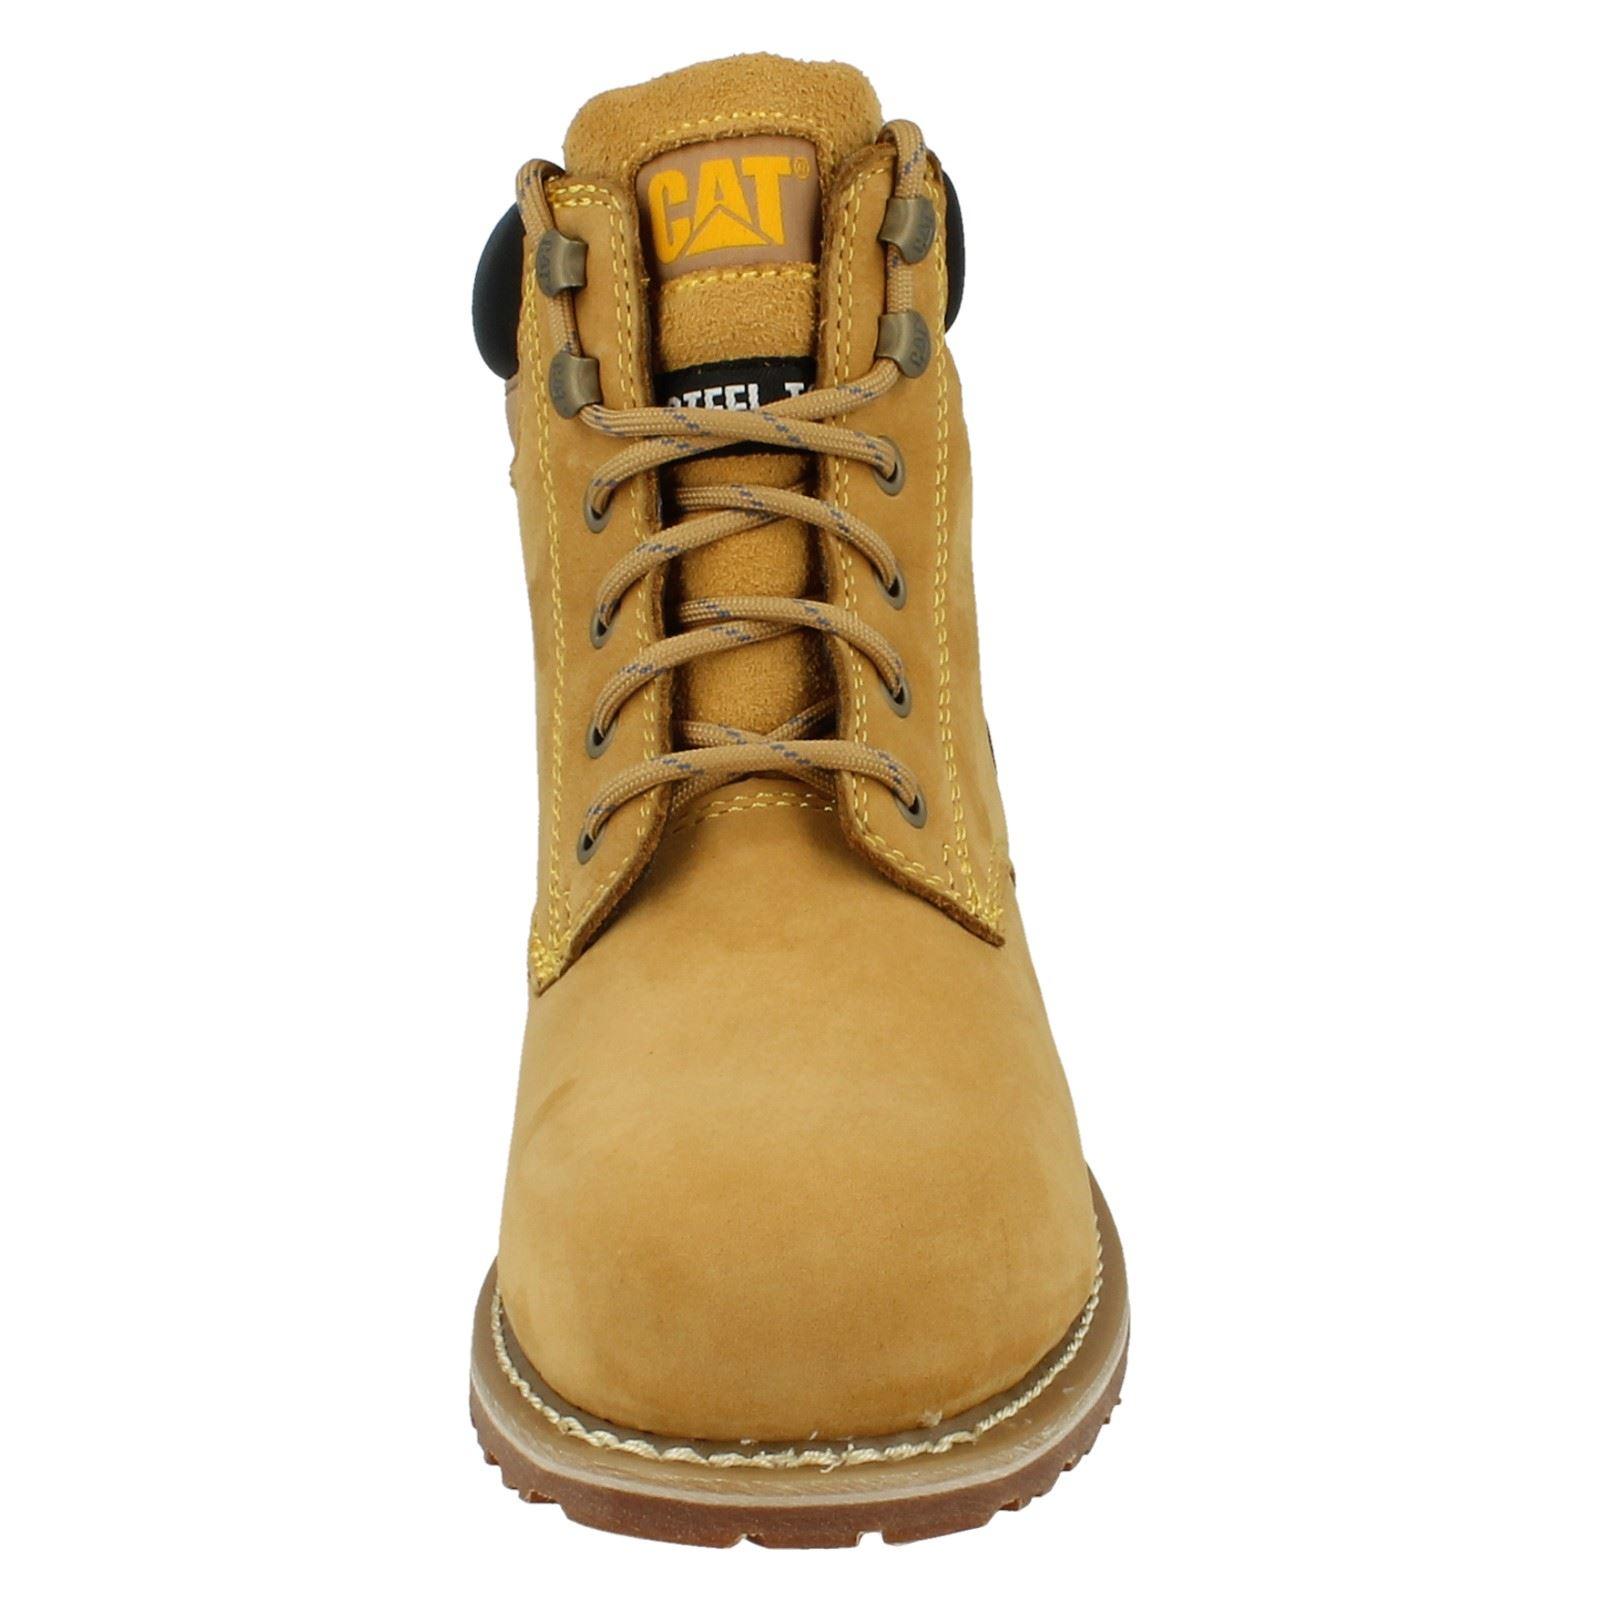 Simple Clothes Shoes Amp Accessories Gt Women39s Shoes Gt Boots